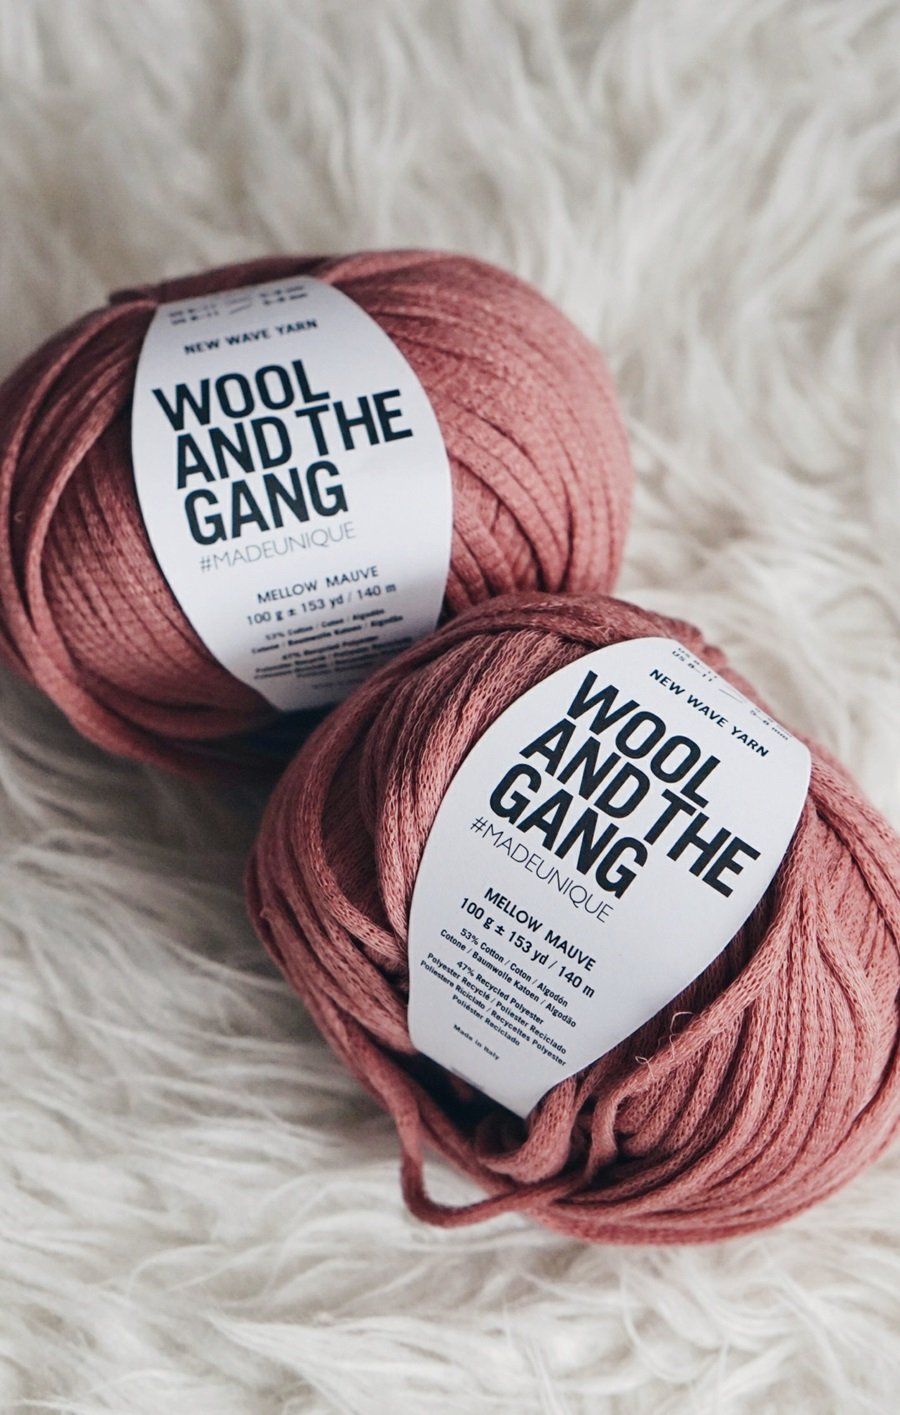 new wave yarn2.jpg